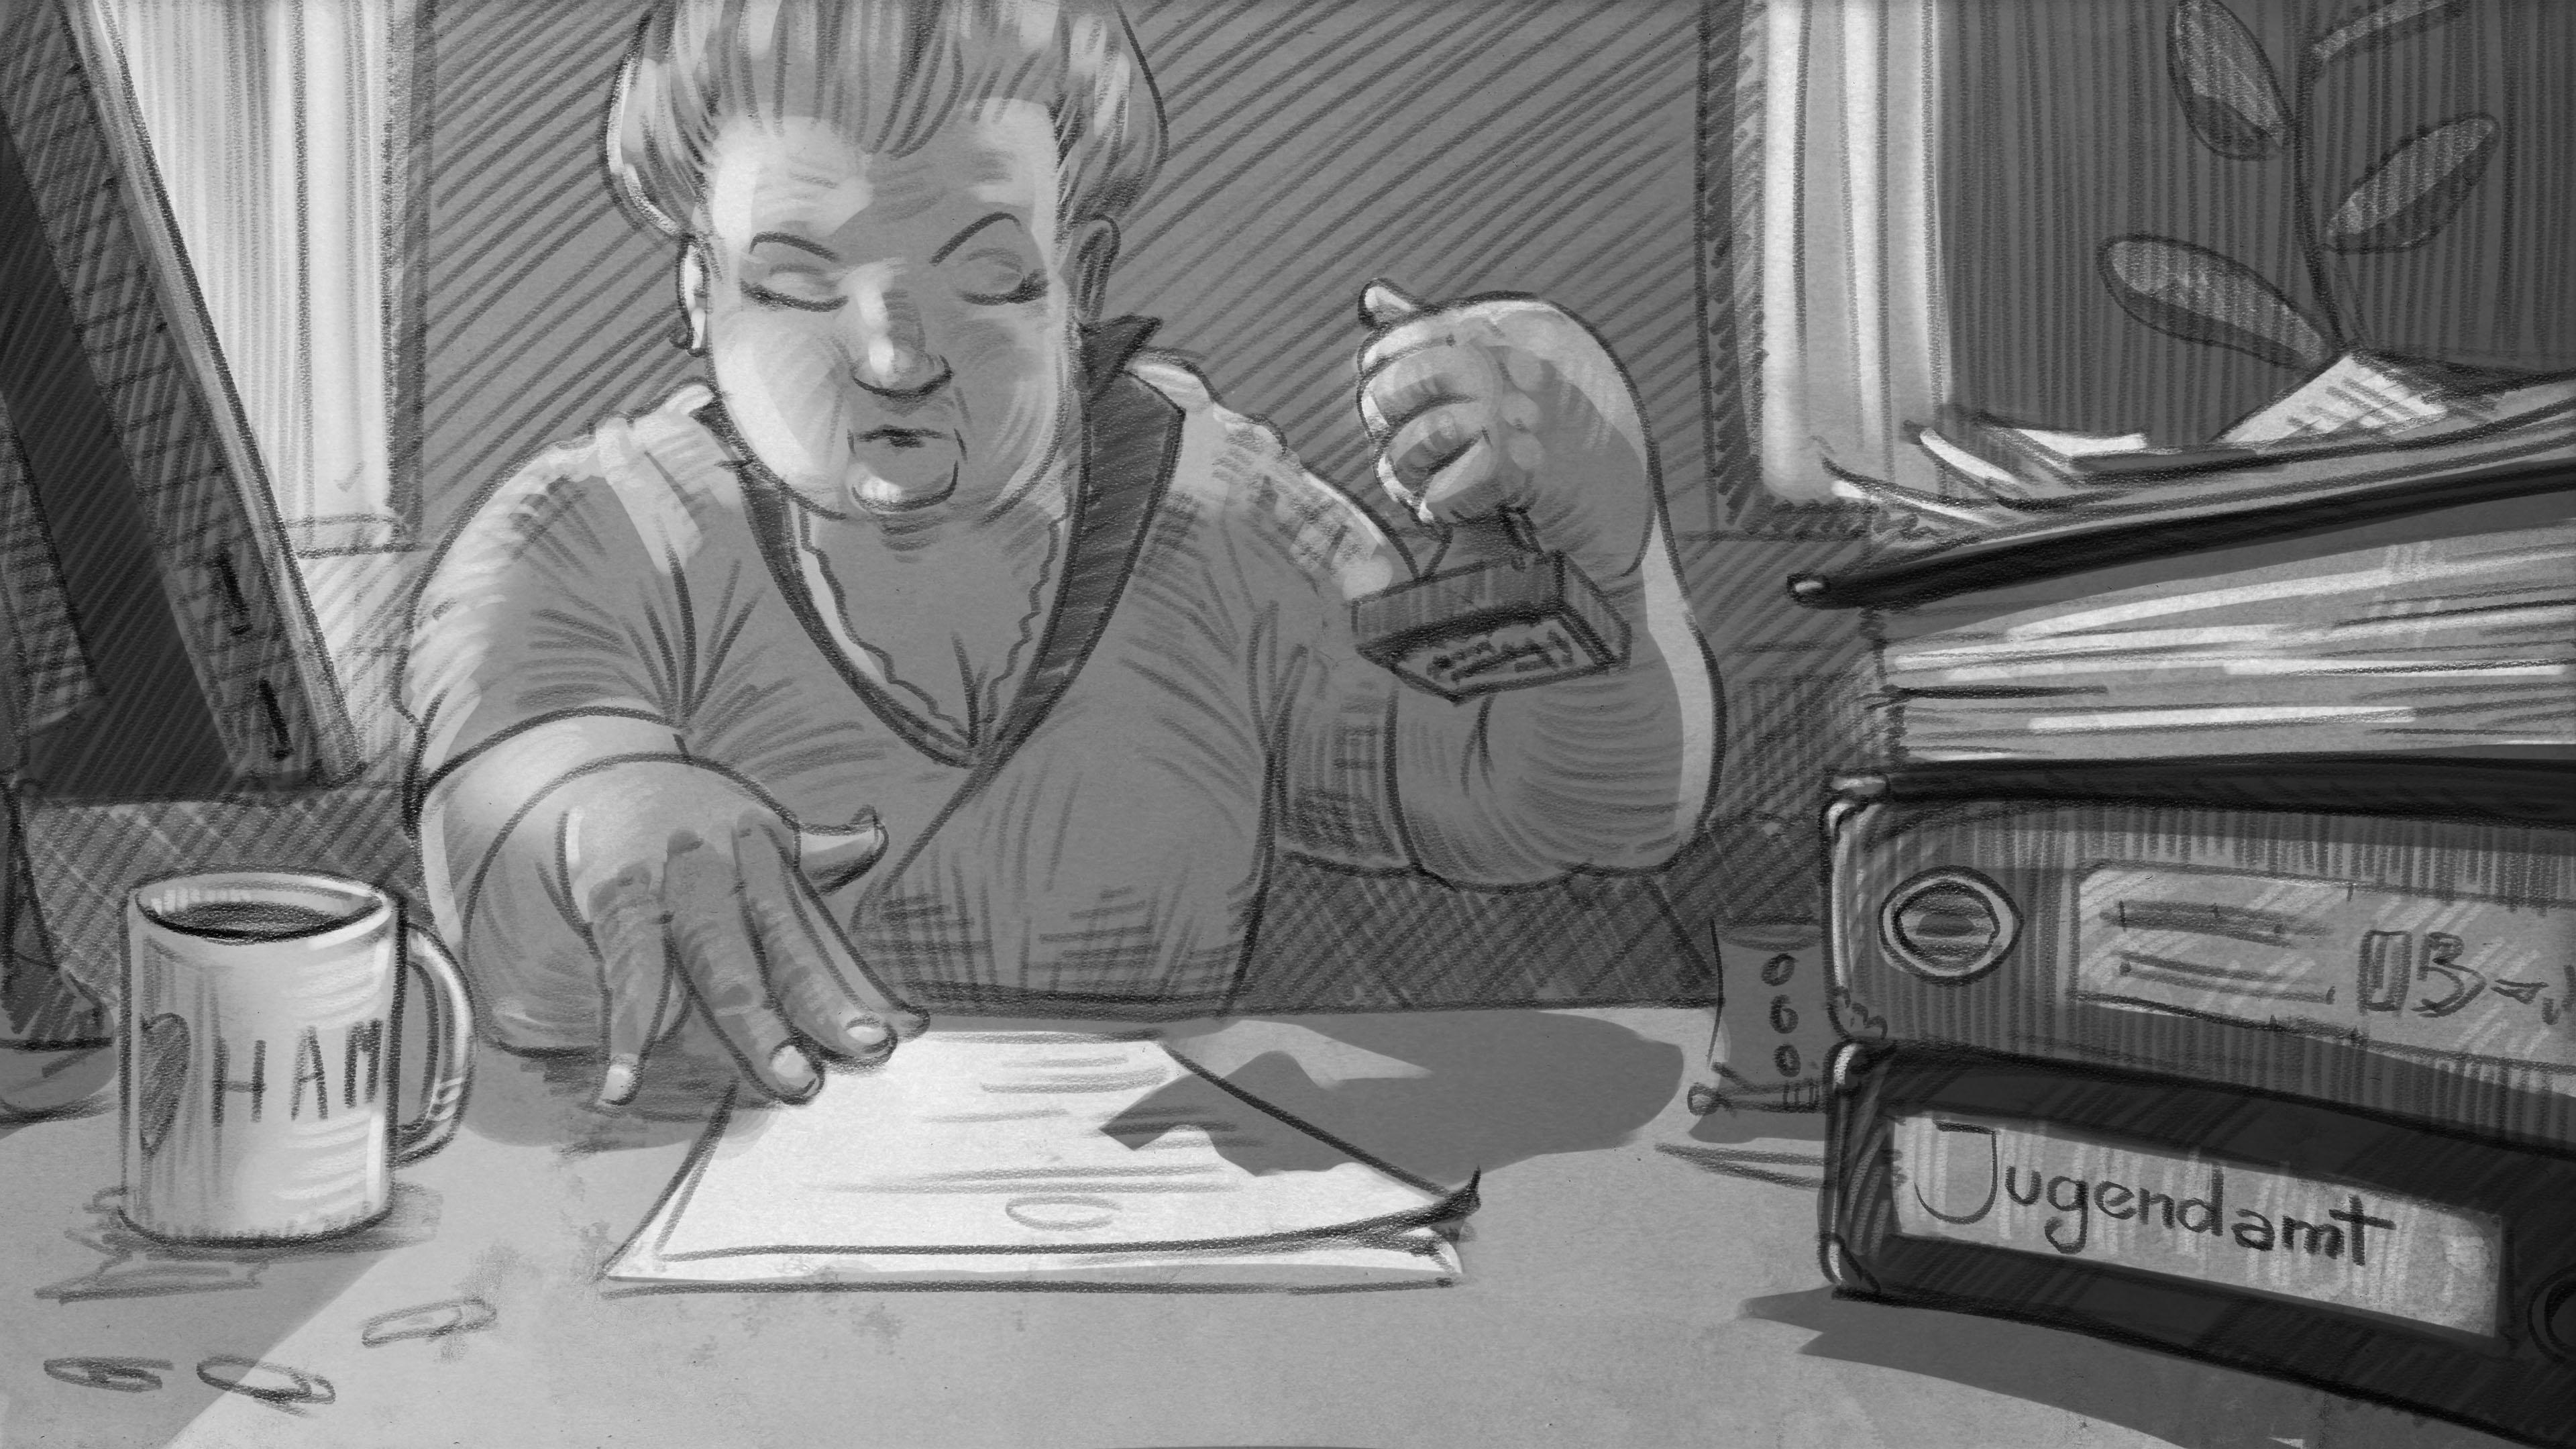 Illustration: Jugendamt-Sachbearbeiterin stempelt Antrag